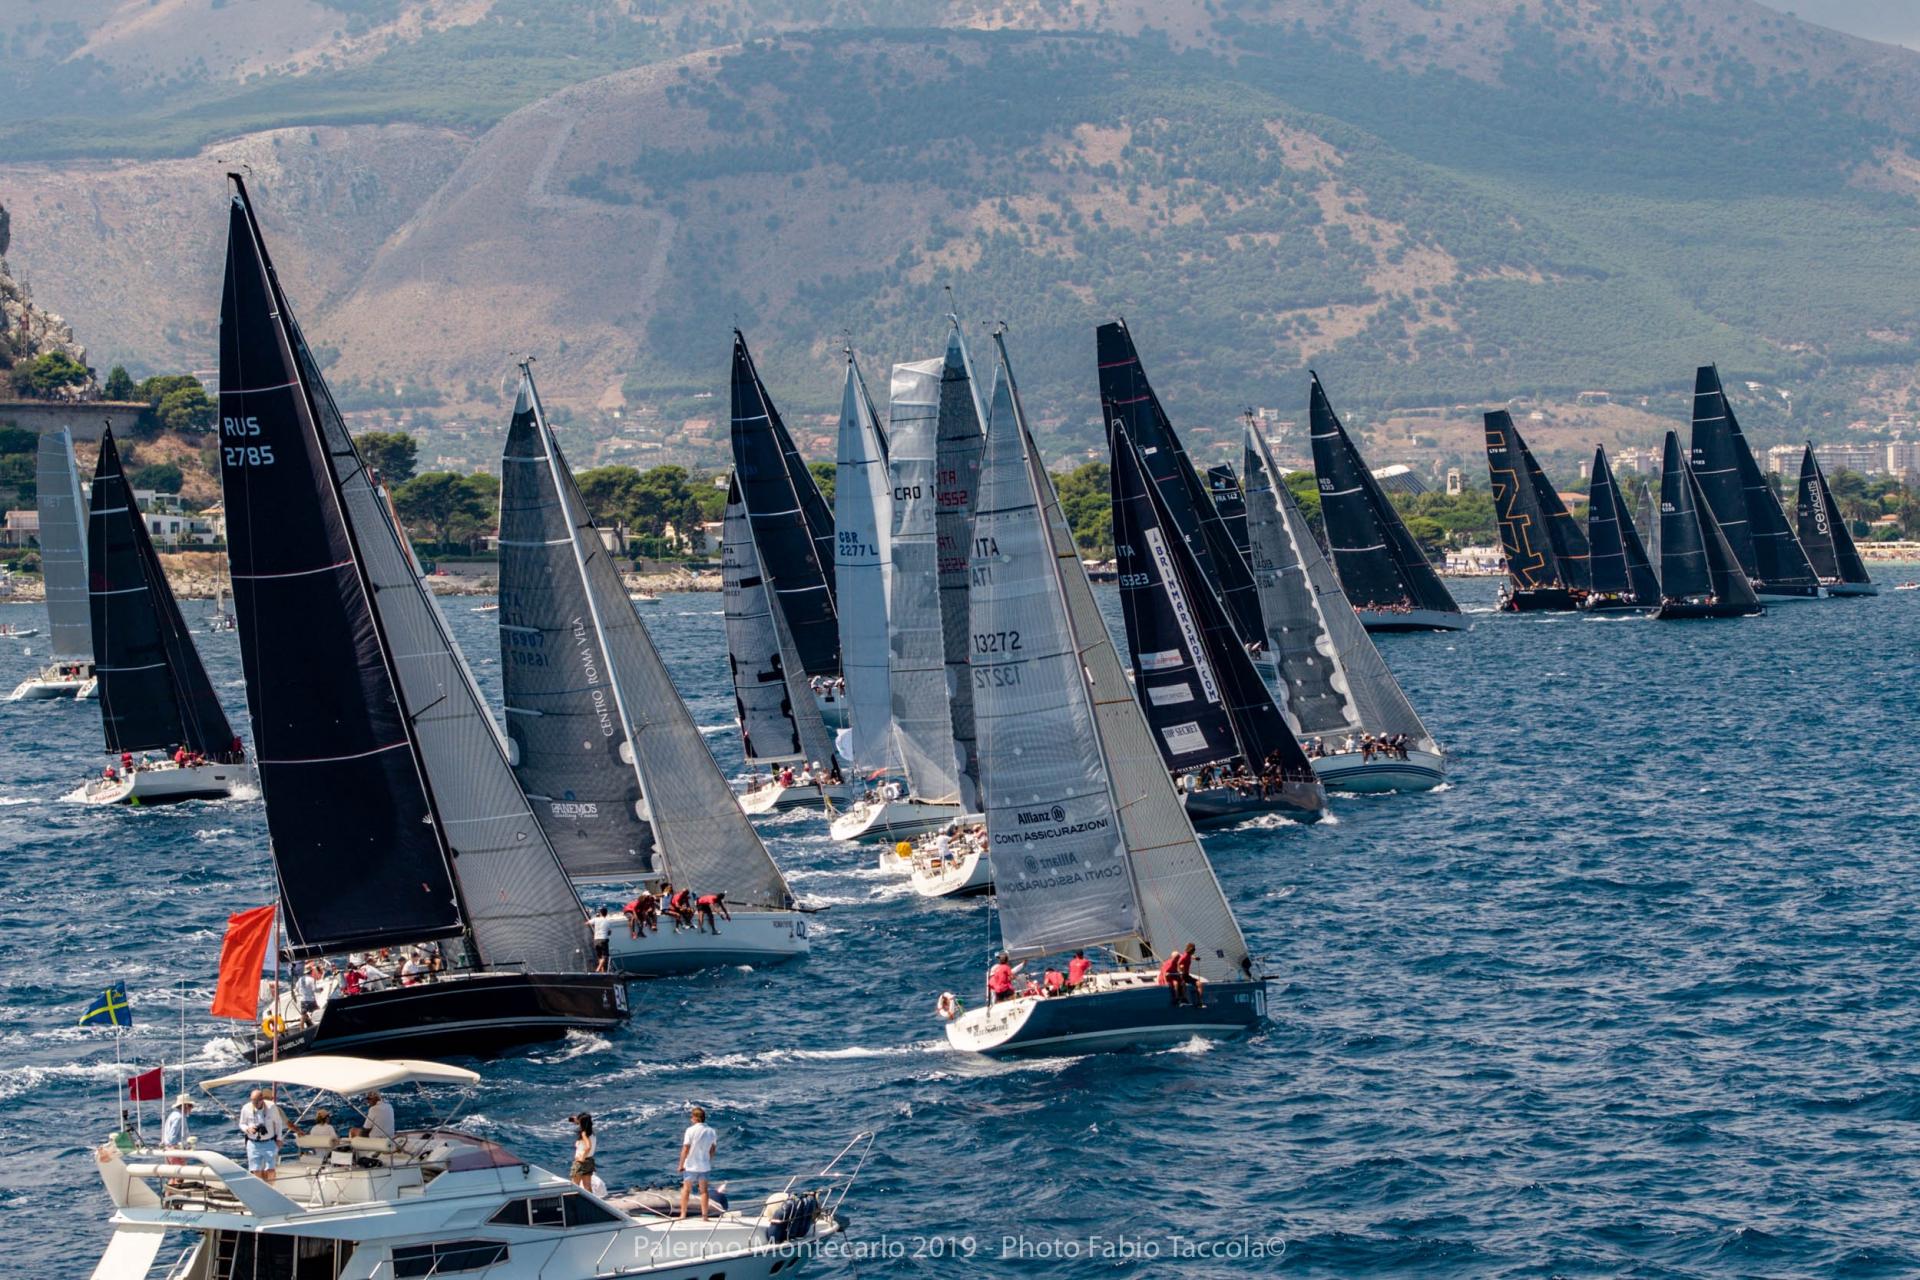 Partita oggi la Palermo - Porto Cervo - Montecarlo - NEWS - Yacht Club Costa Smeralda